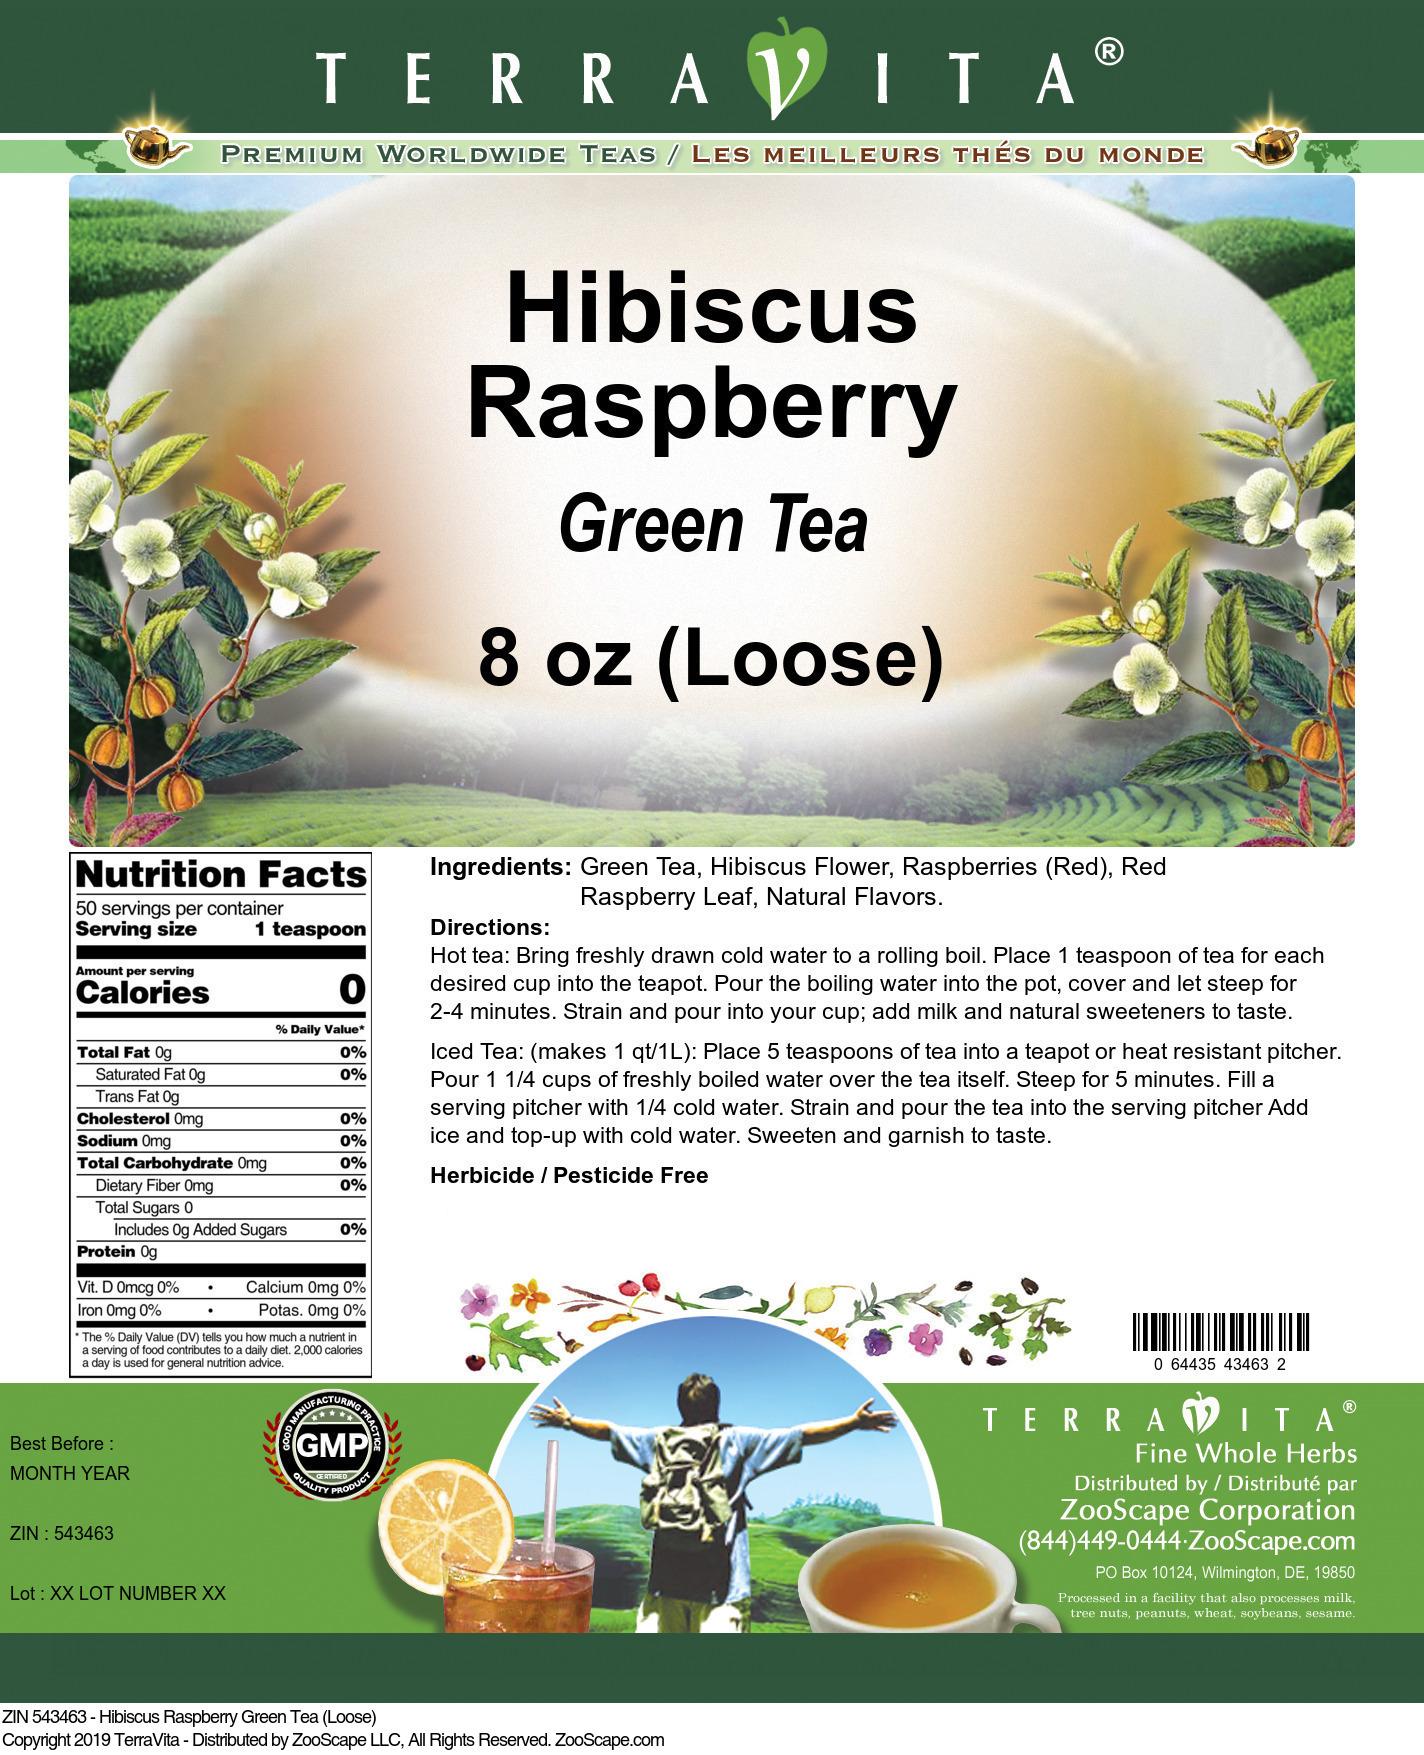 Hibiscus Raspberry Green Tea